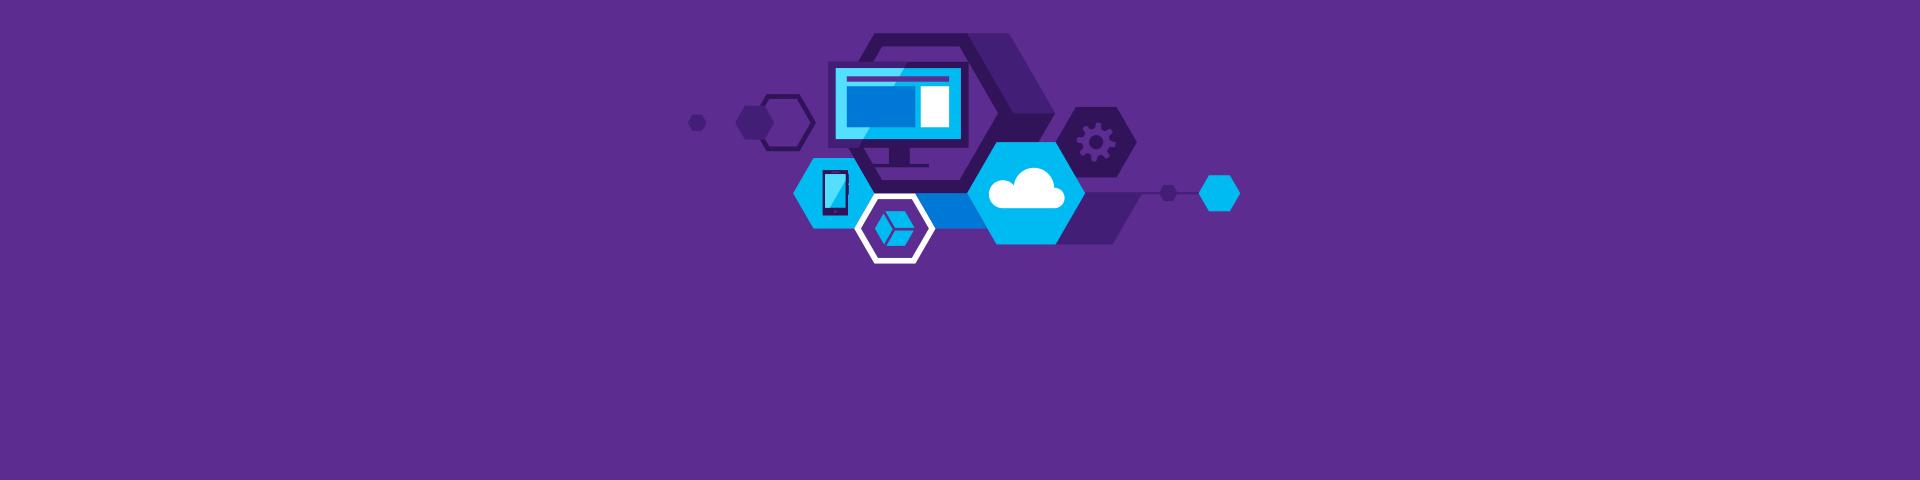 PC, 휴대폰, 클라우드 및 다른 기술 아이콘